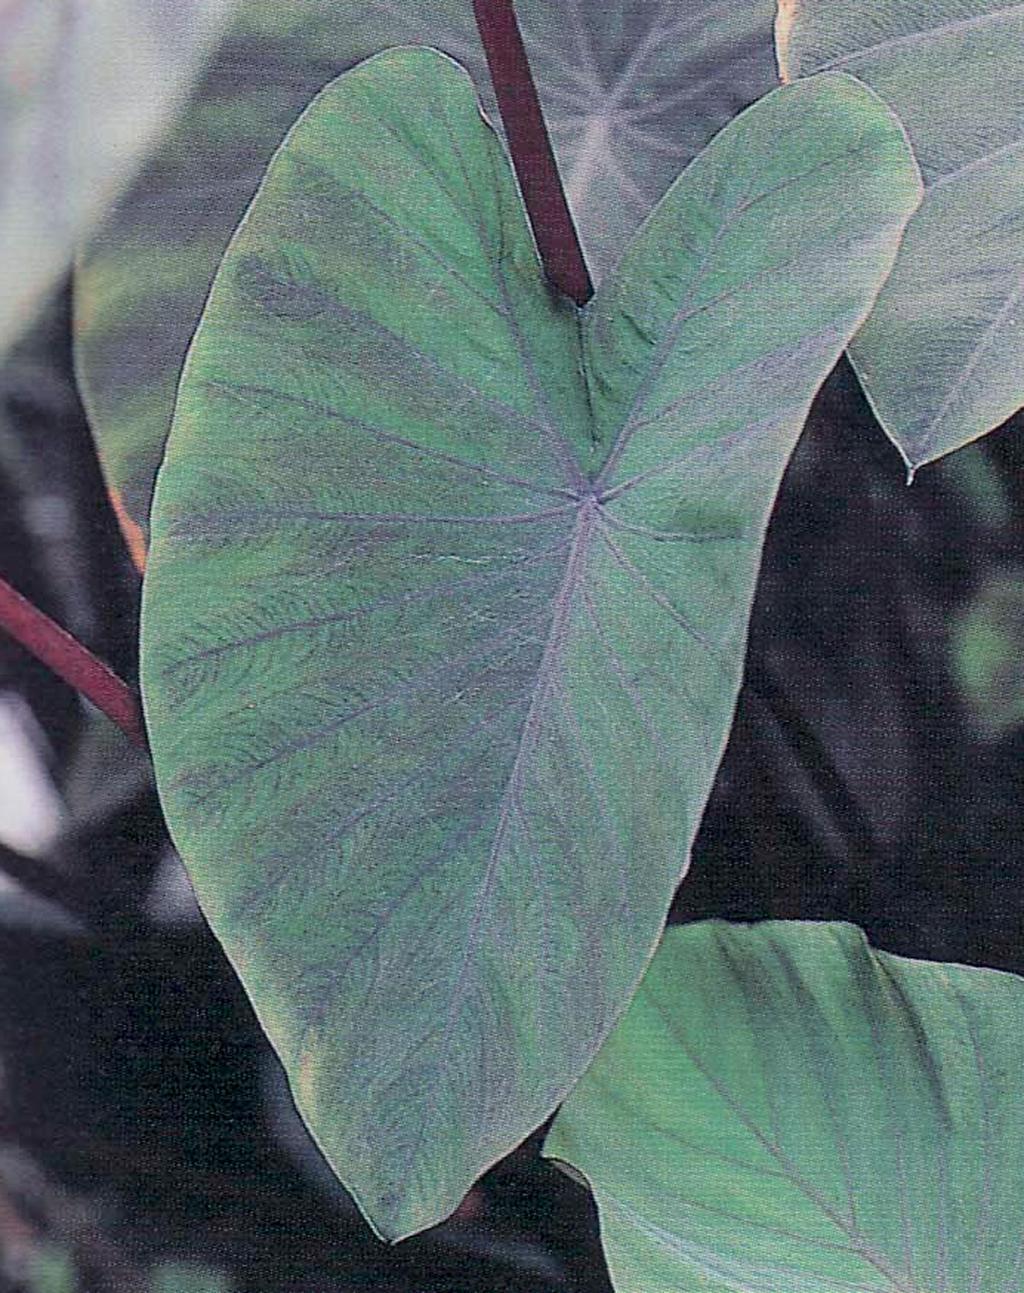 Heart Of The Jungle Elephant S Ear Colocasia Esculenta